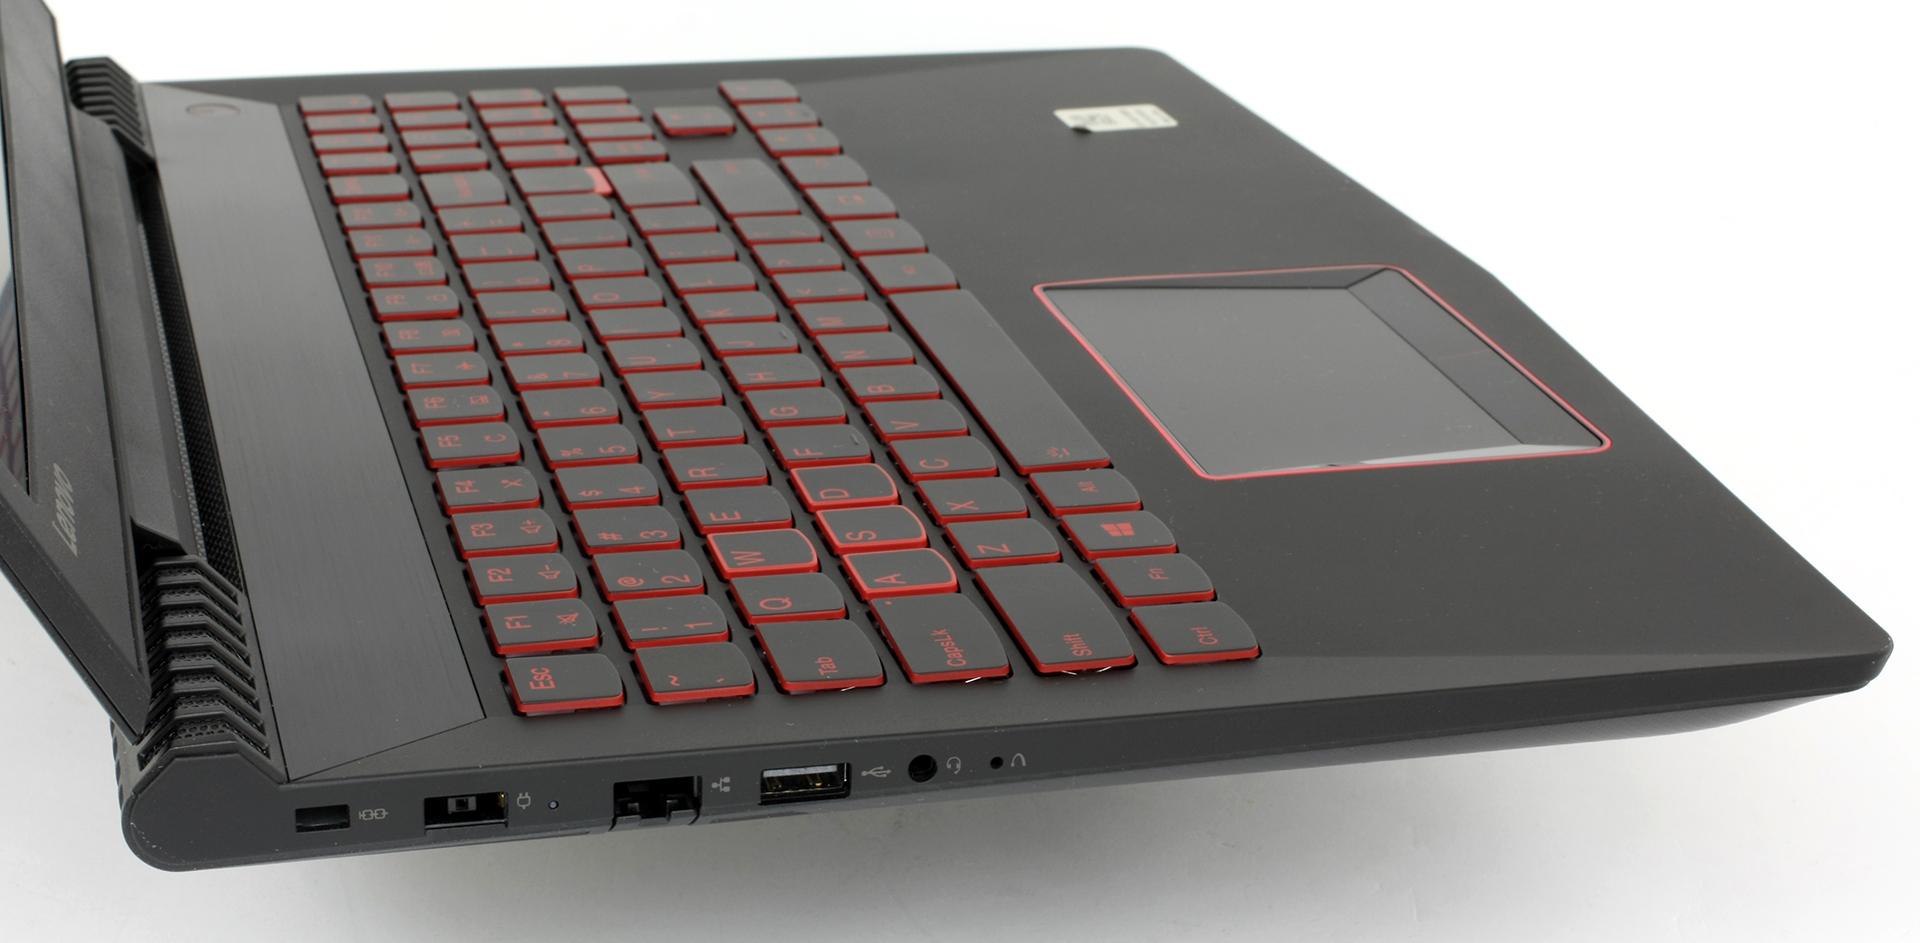 Lenovo Legion Y520 (GTX 1050 Ti) review – the Y-series are